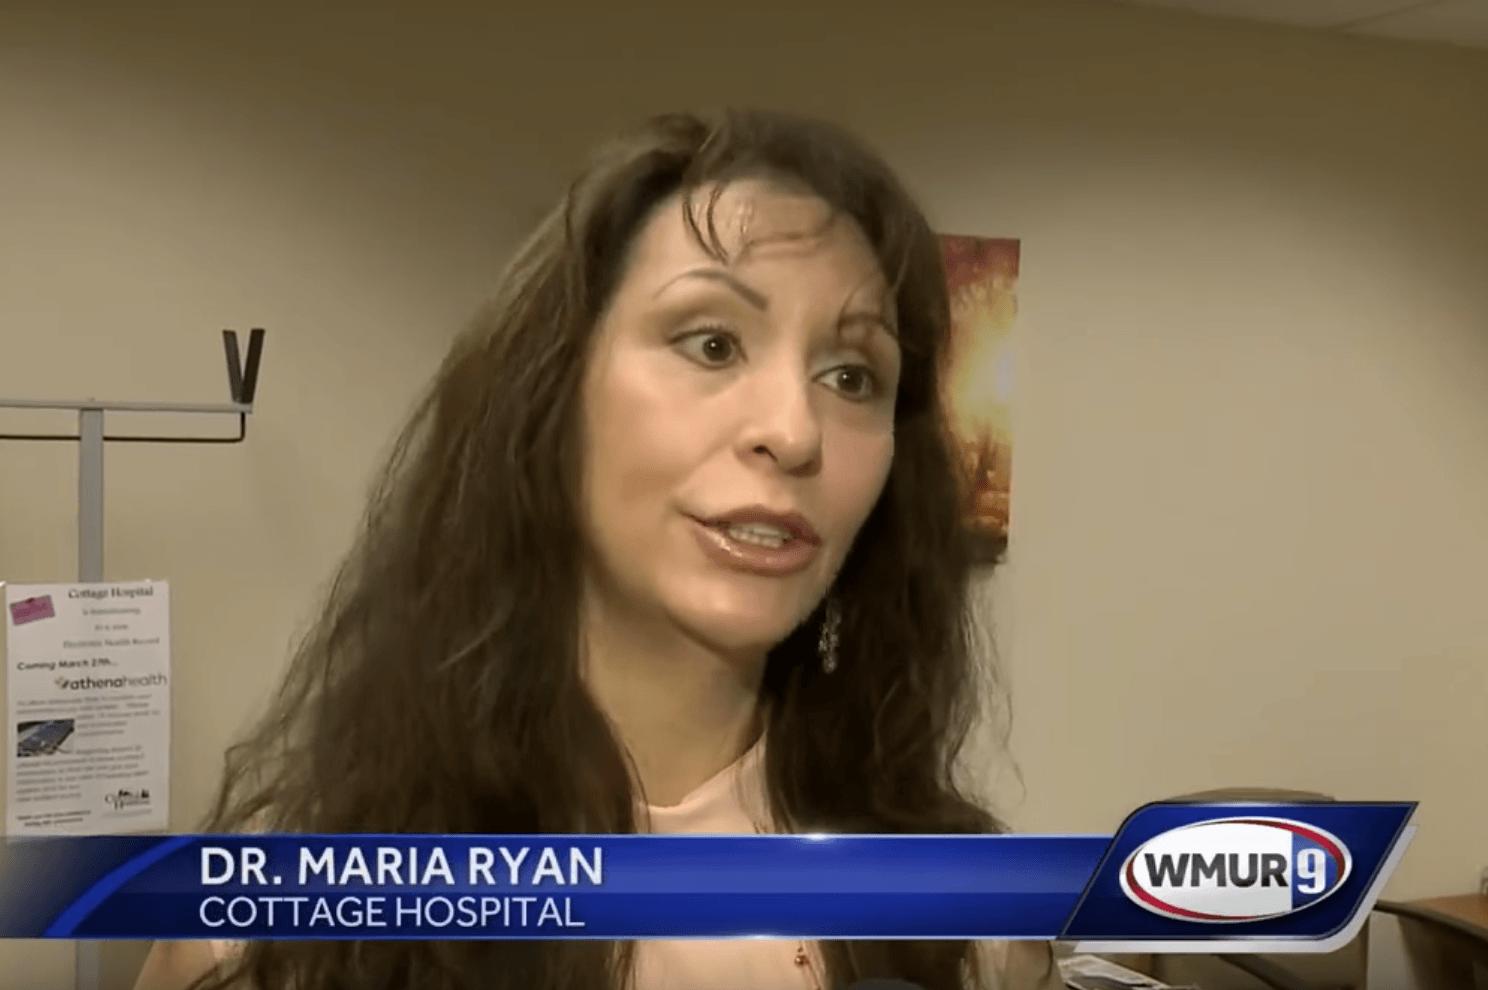 Dr. Maria Ryan